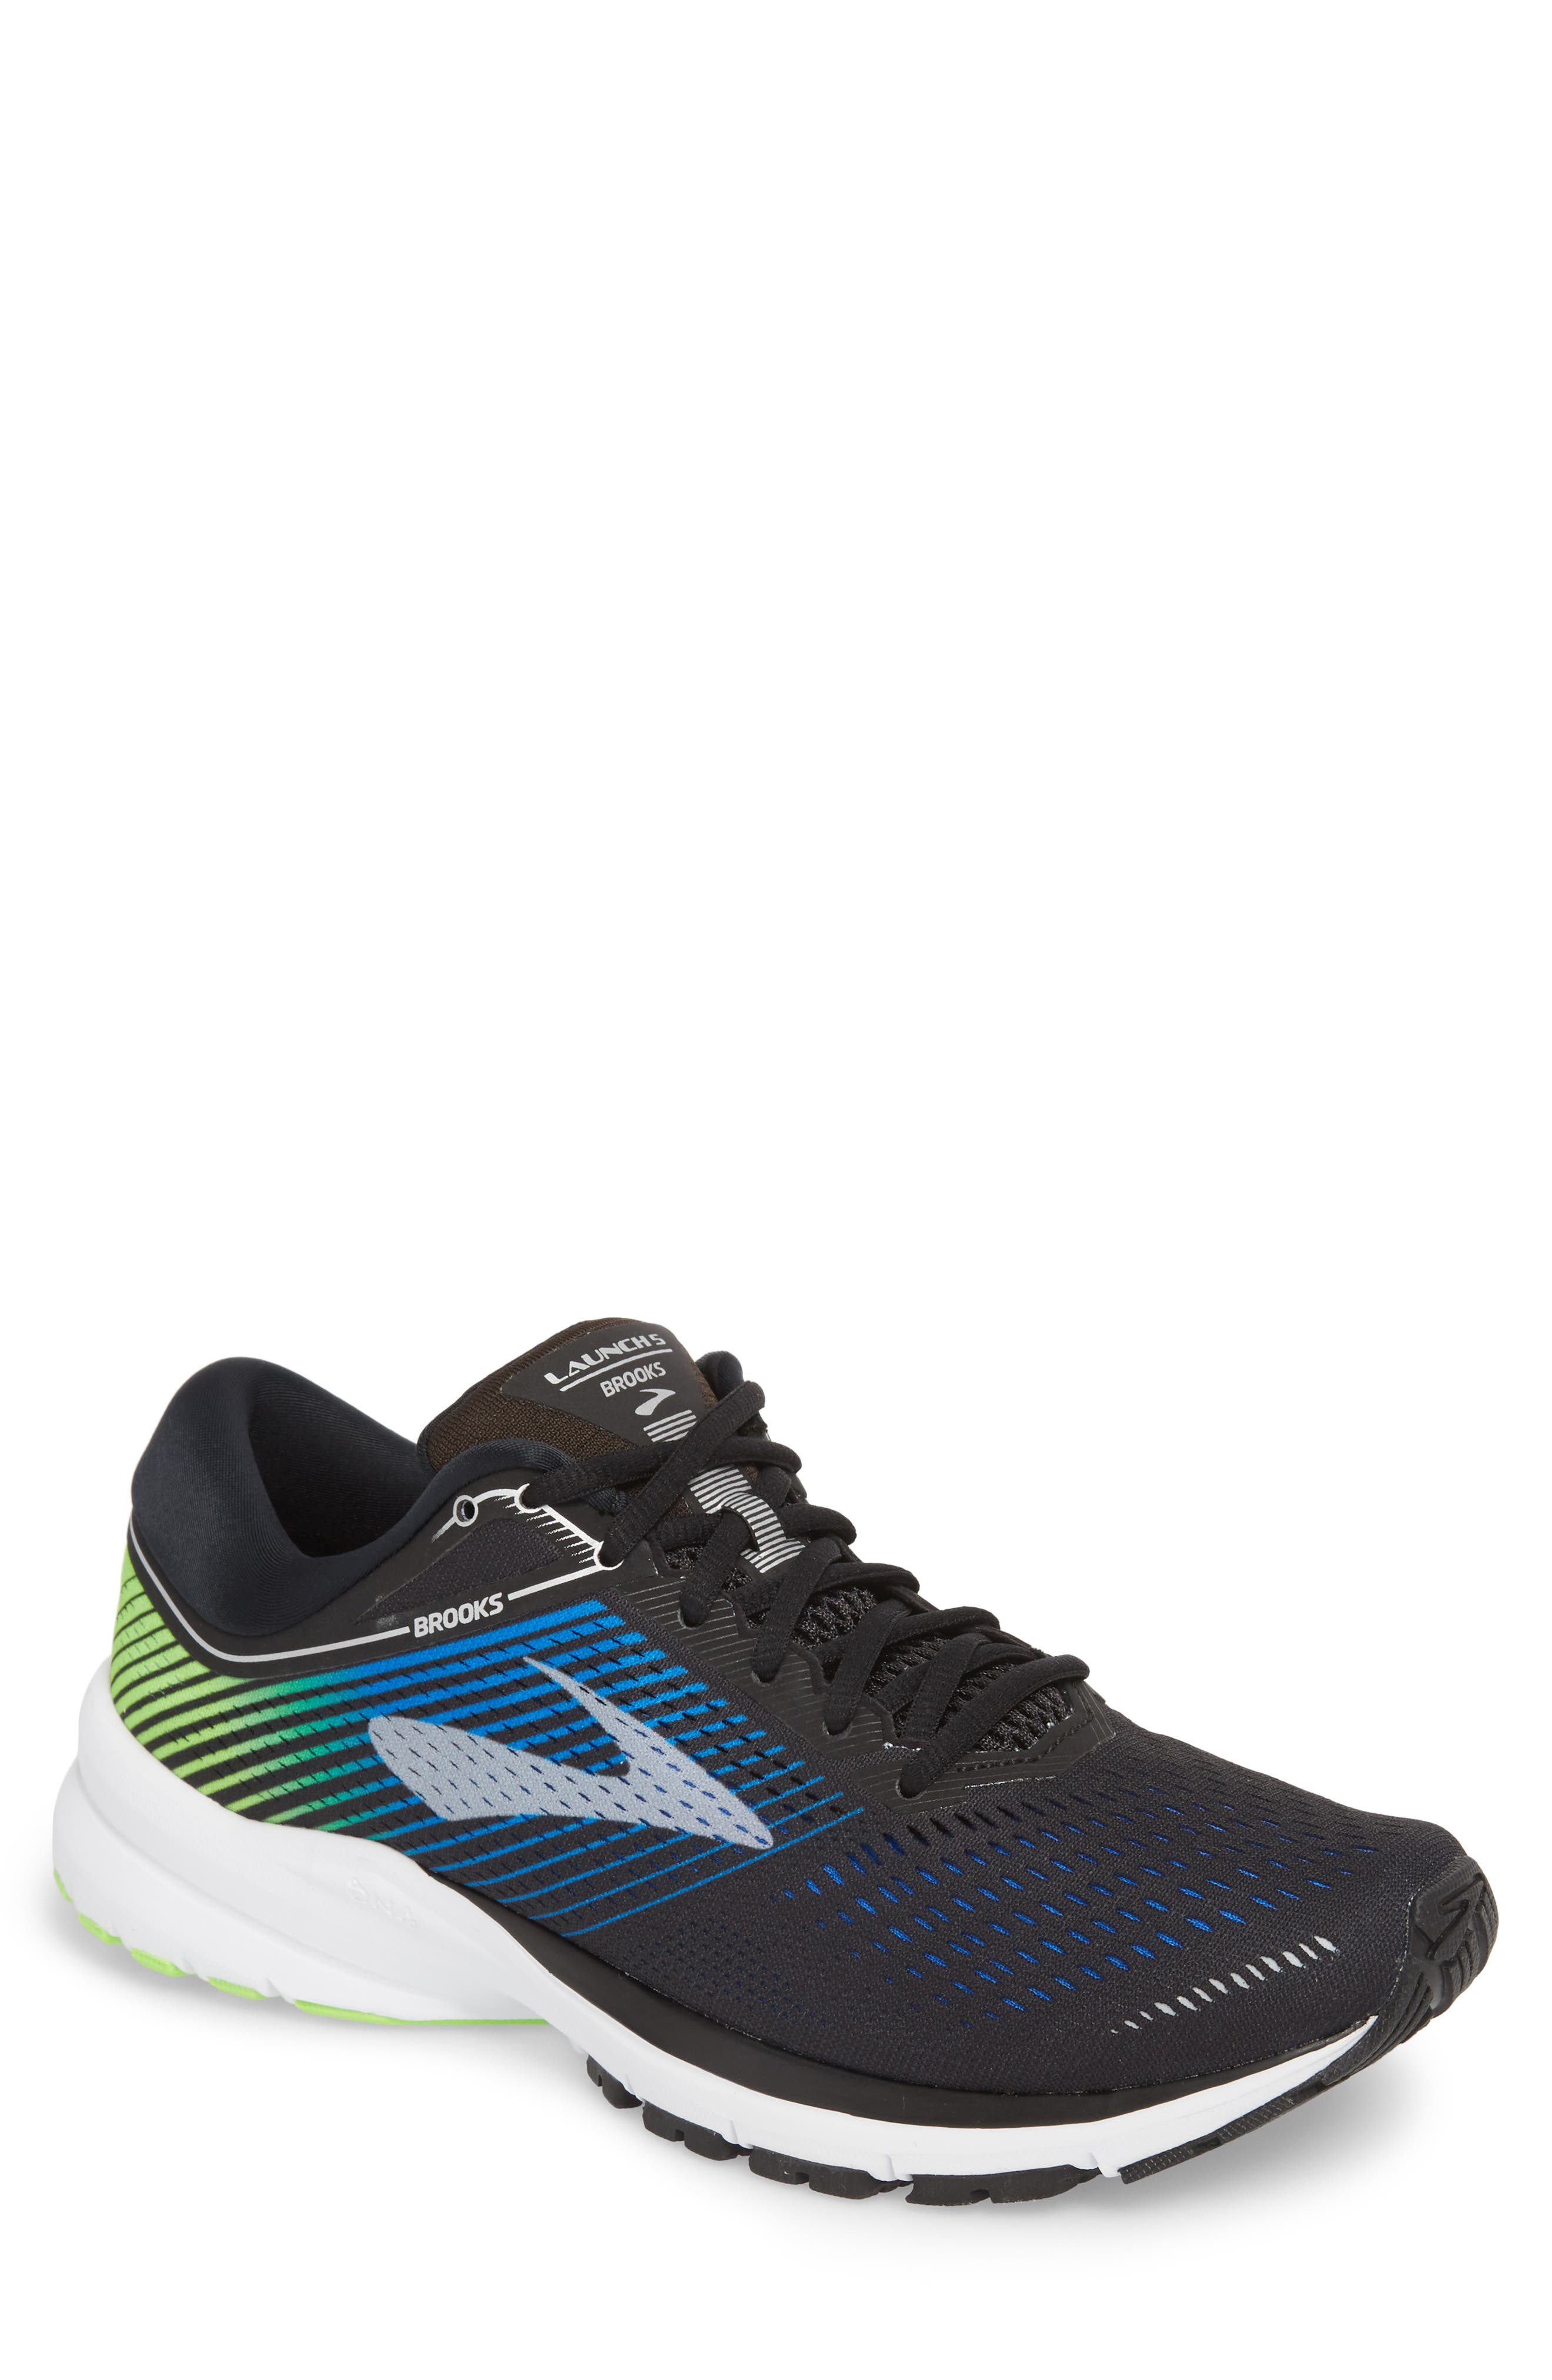 Launch 5 Running Shoe, Main, color, 016